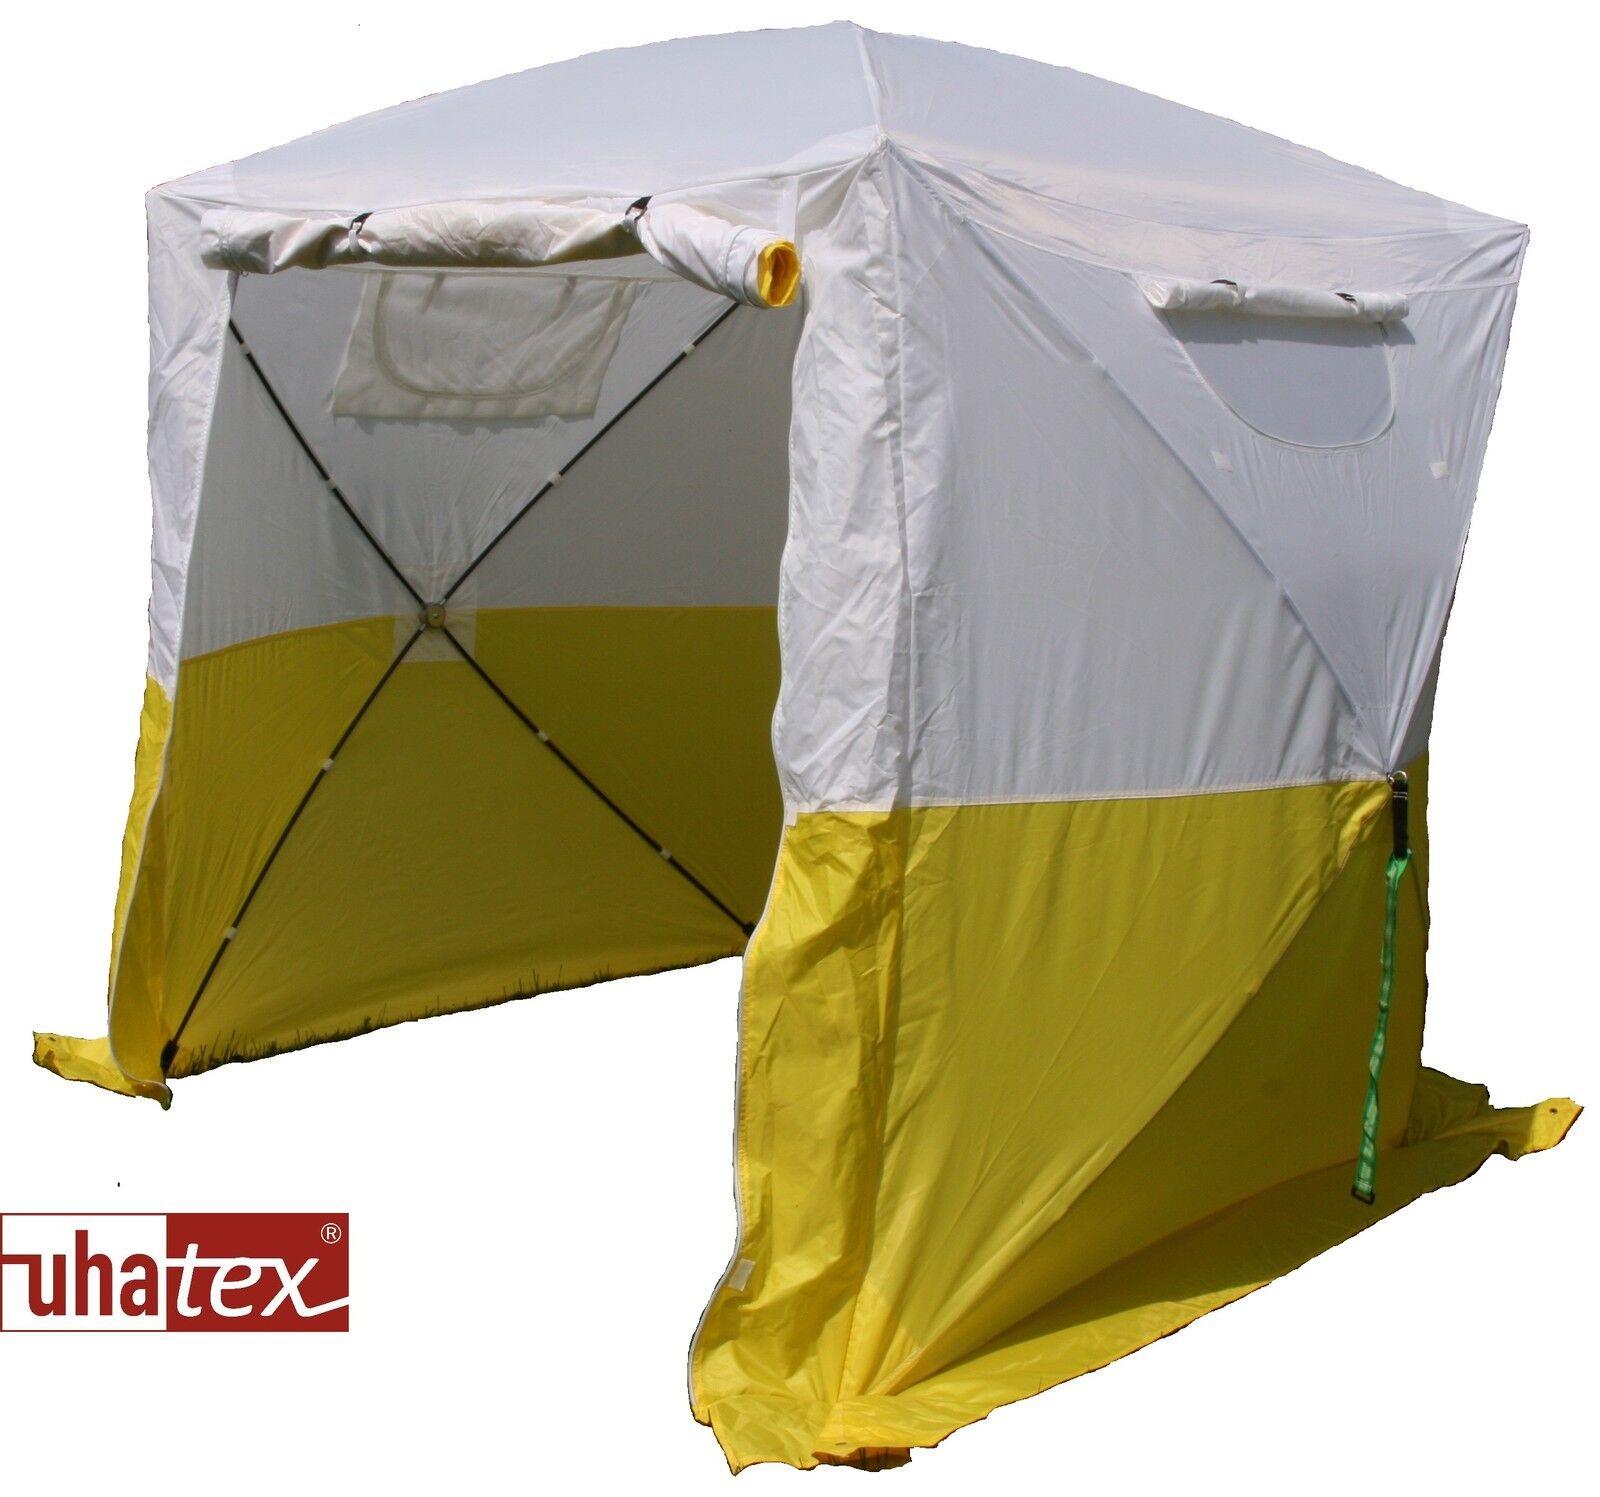 Bauzelt, montaggio tenda, lötzelt, parapioggia, montaggio in 30 secondi